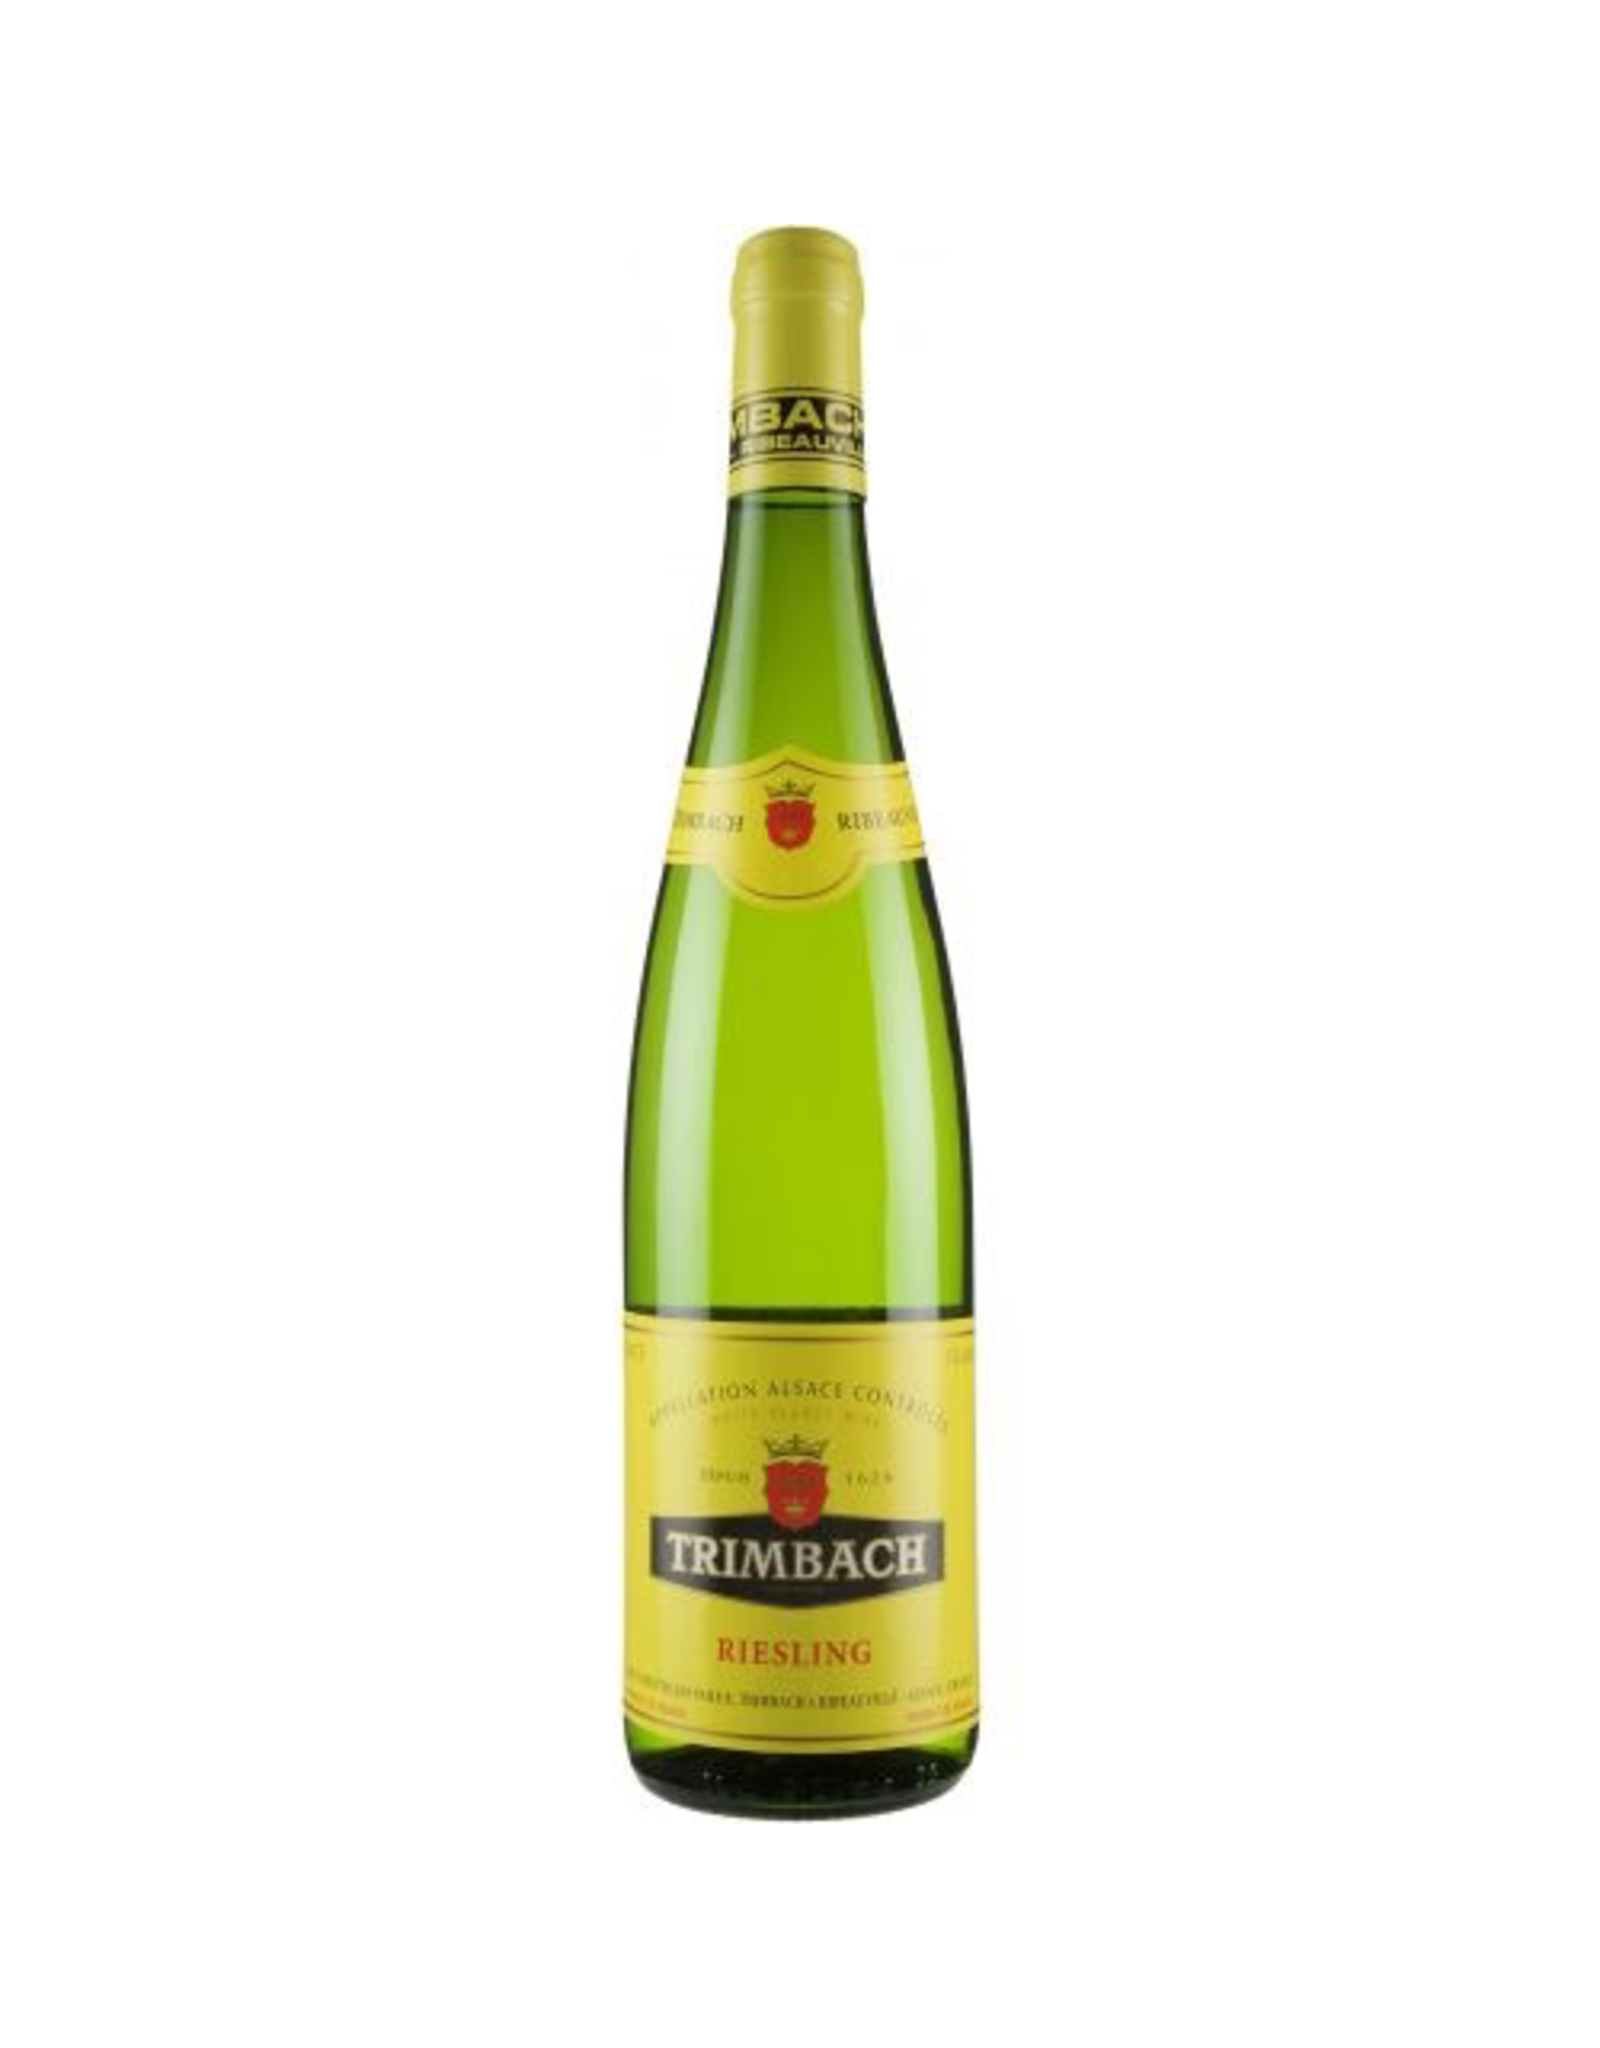 White Wine 2018, Trimbach, Rieseling, Alsace, Alsace, France, 13% Alc, CTnr TW91